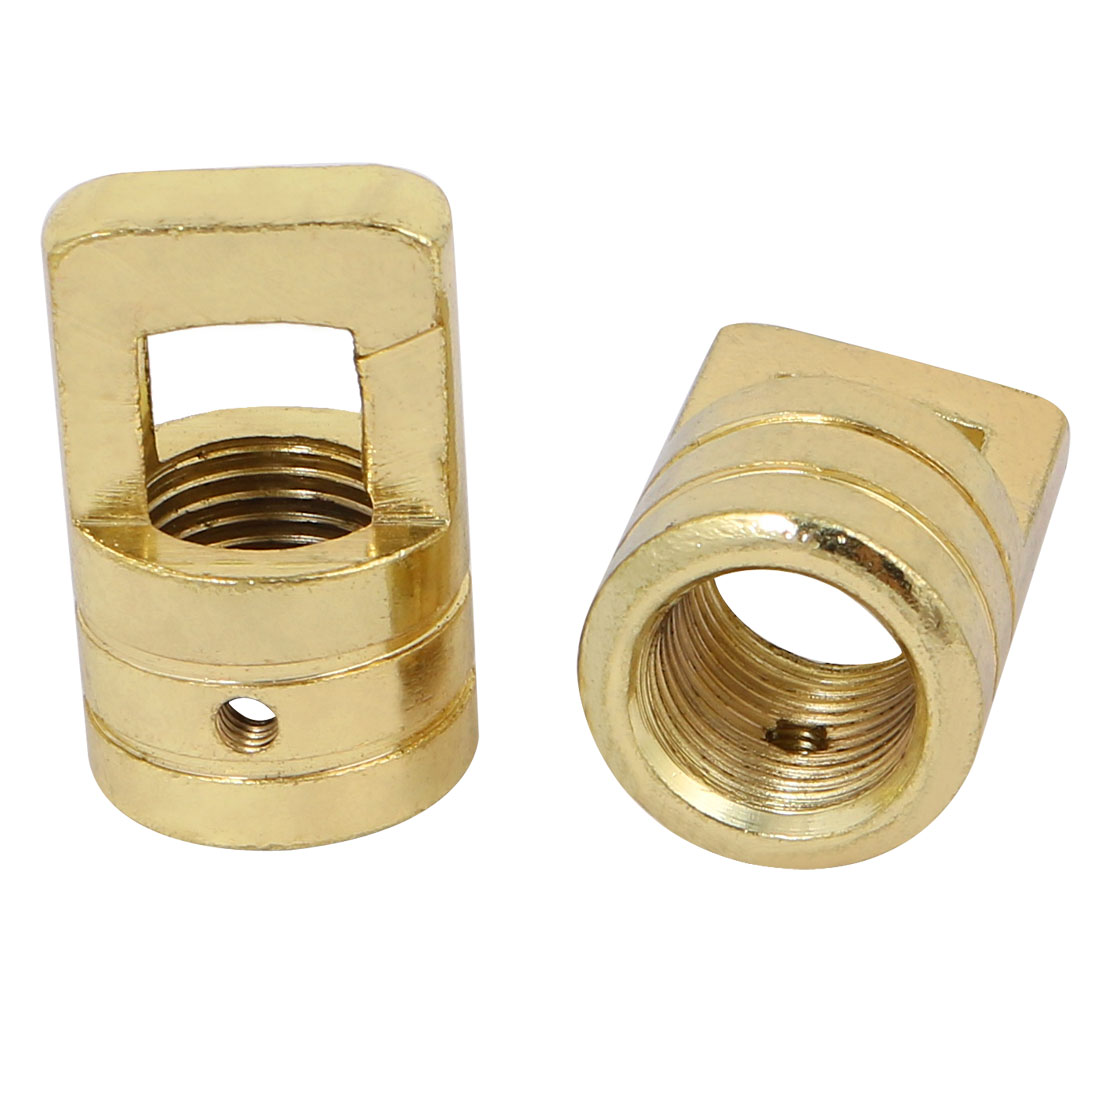 2pcs 23mm x 37mm M16 Female Thread Lamp Loop Ring Golden for DIY Chandelier